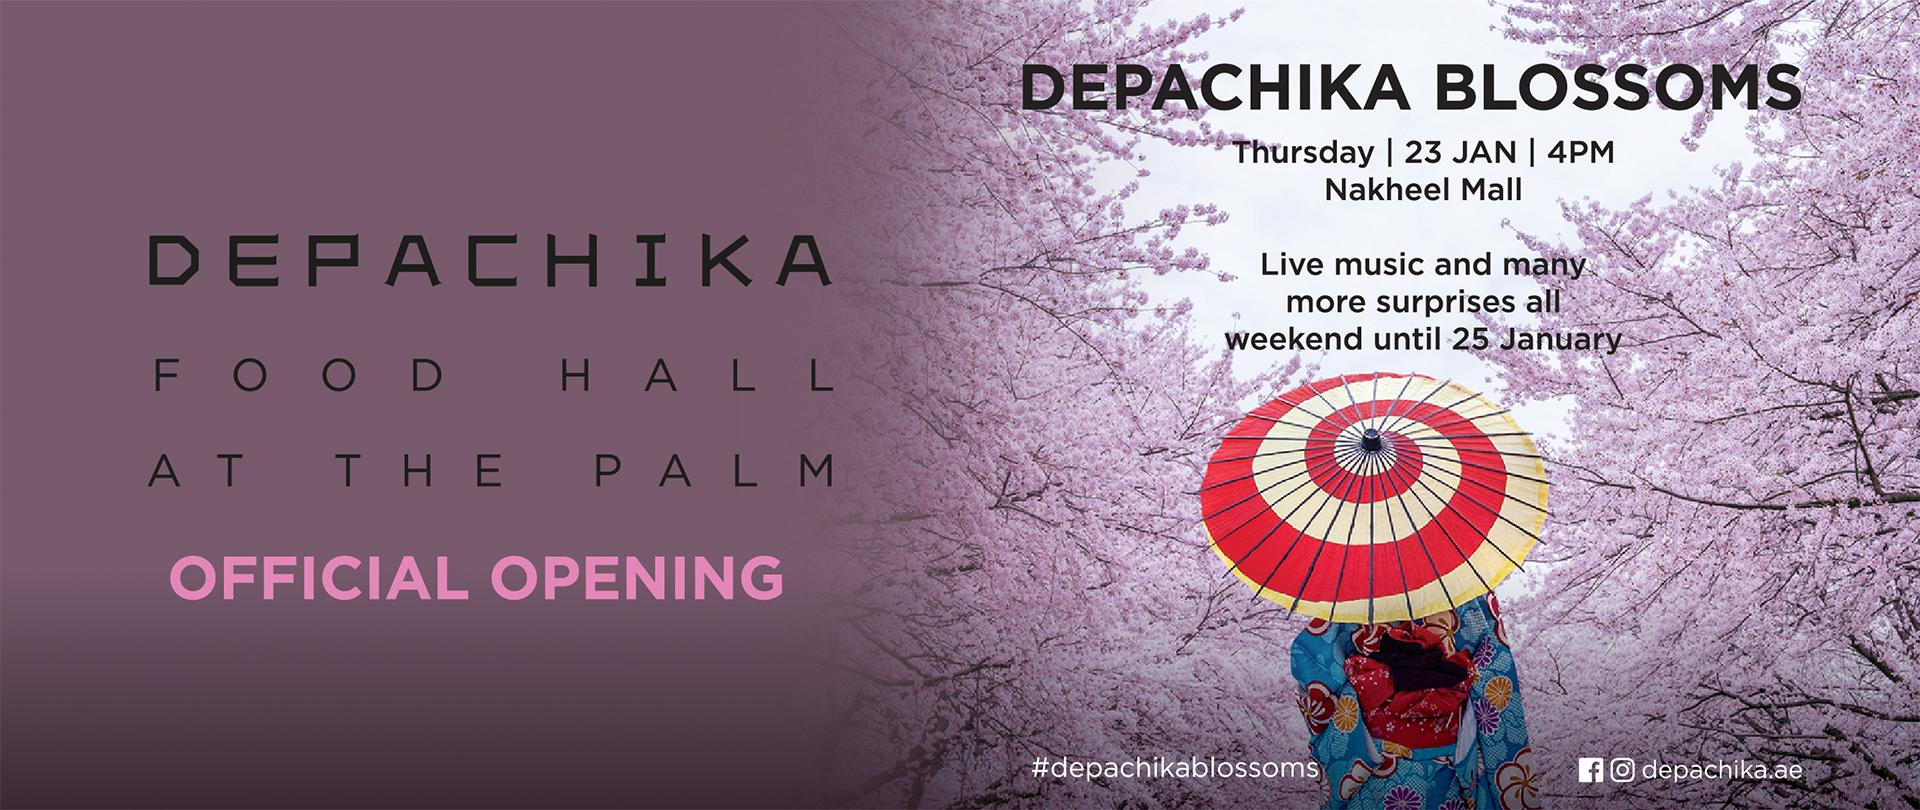 Depachika-at-Nakheel-Mall